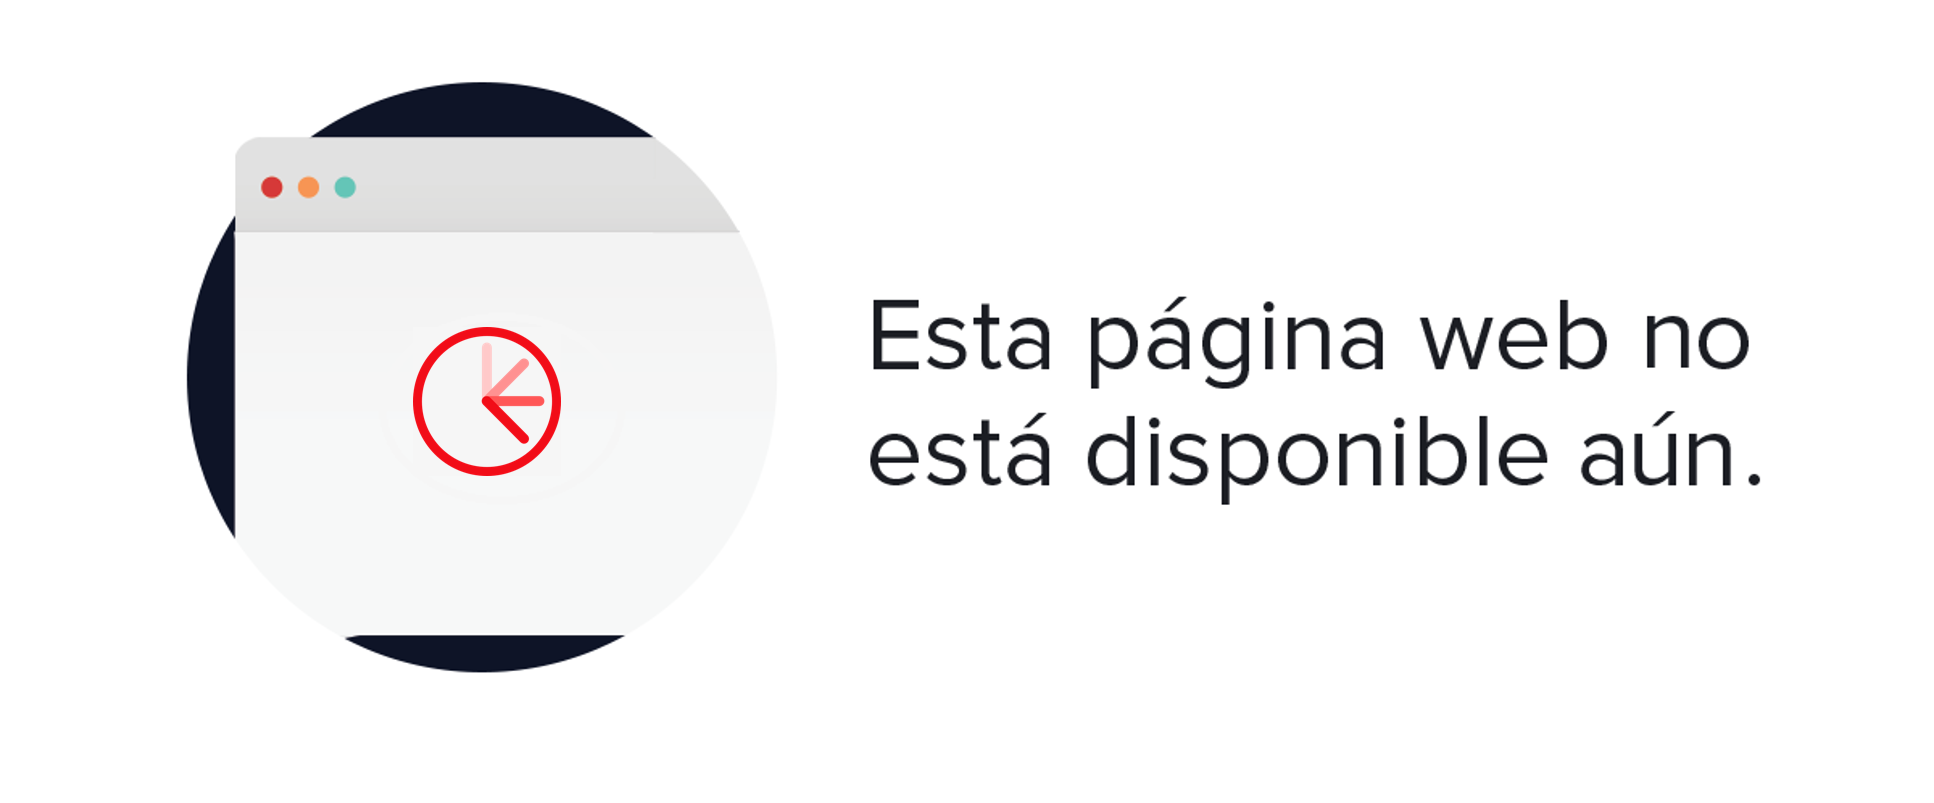 Ralph Lauren Azul Zapatillas Deportivas Hombre 463580 - Barato - LHBWSQT